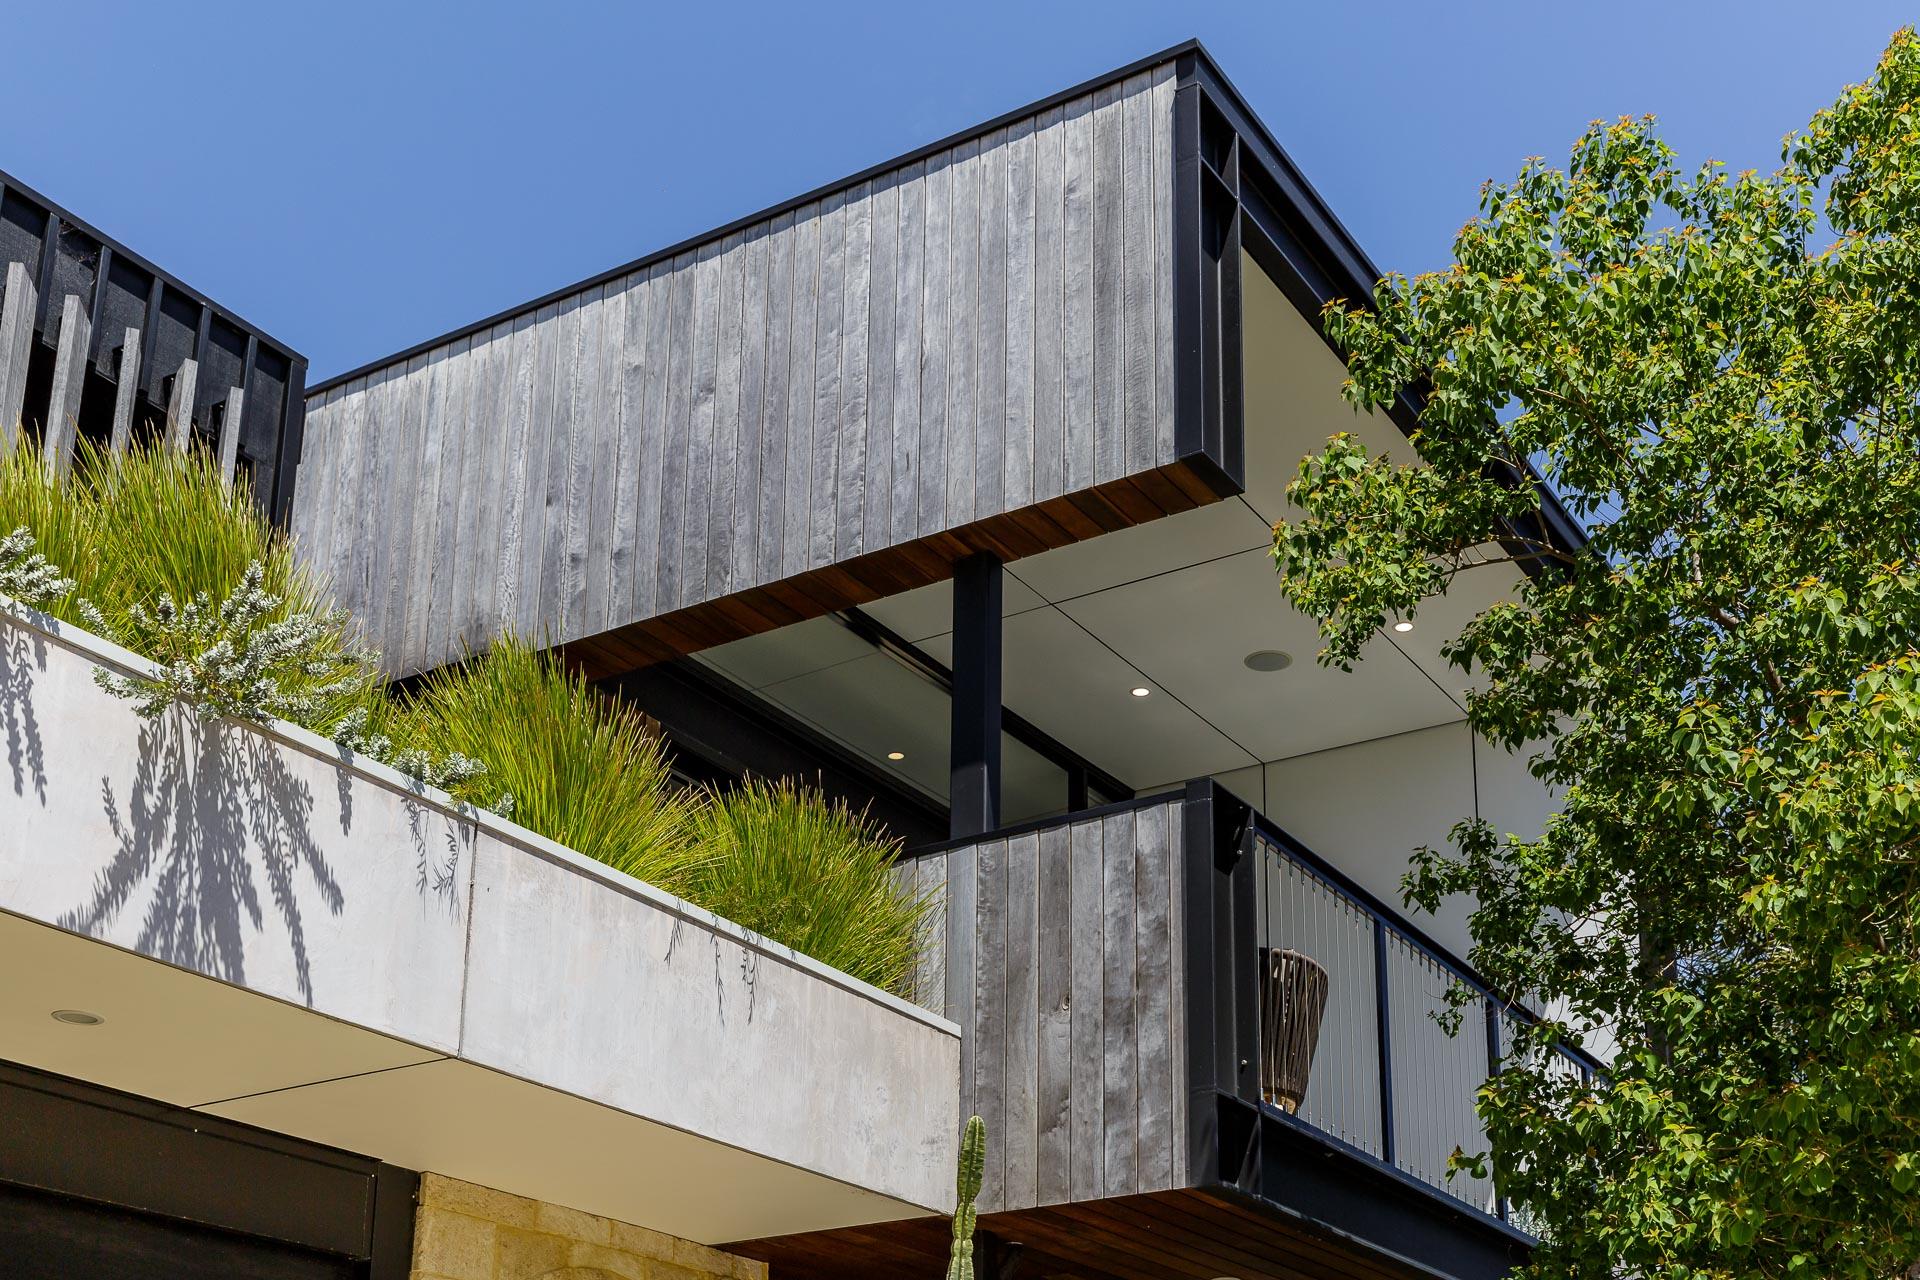 WEB - Architectural Photography Sydney - Open House Perth 2017 - Sebastian Photography 20.jpg